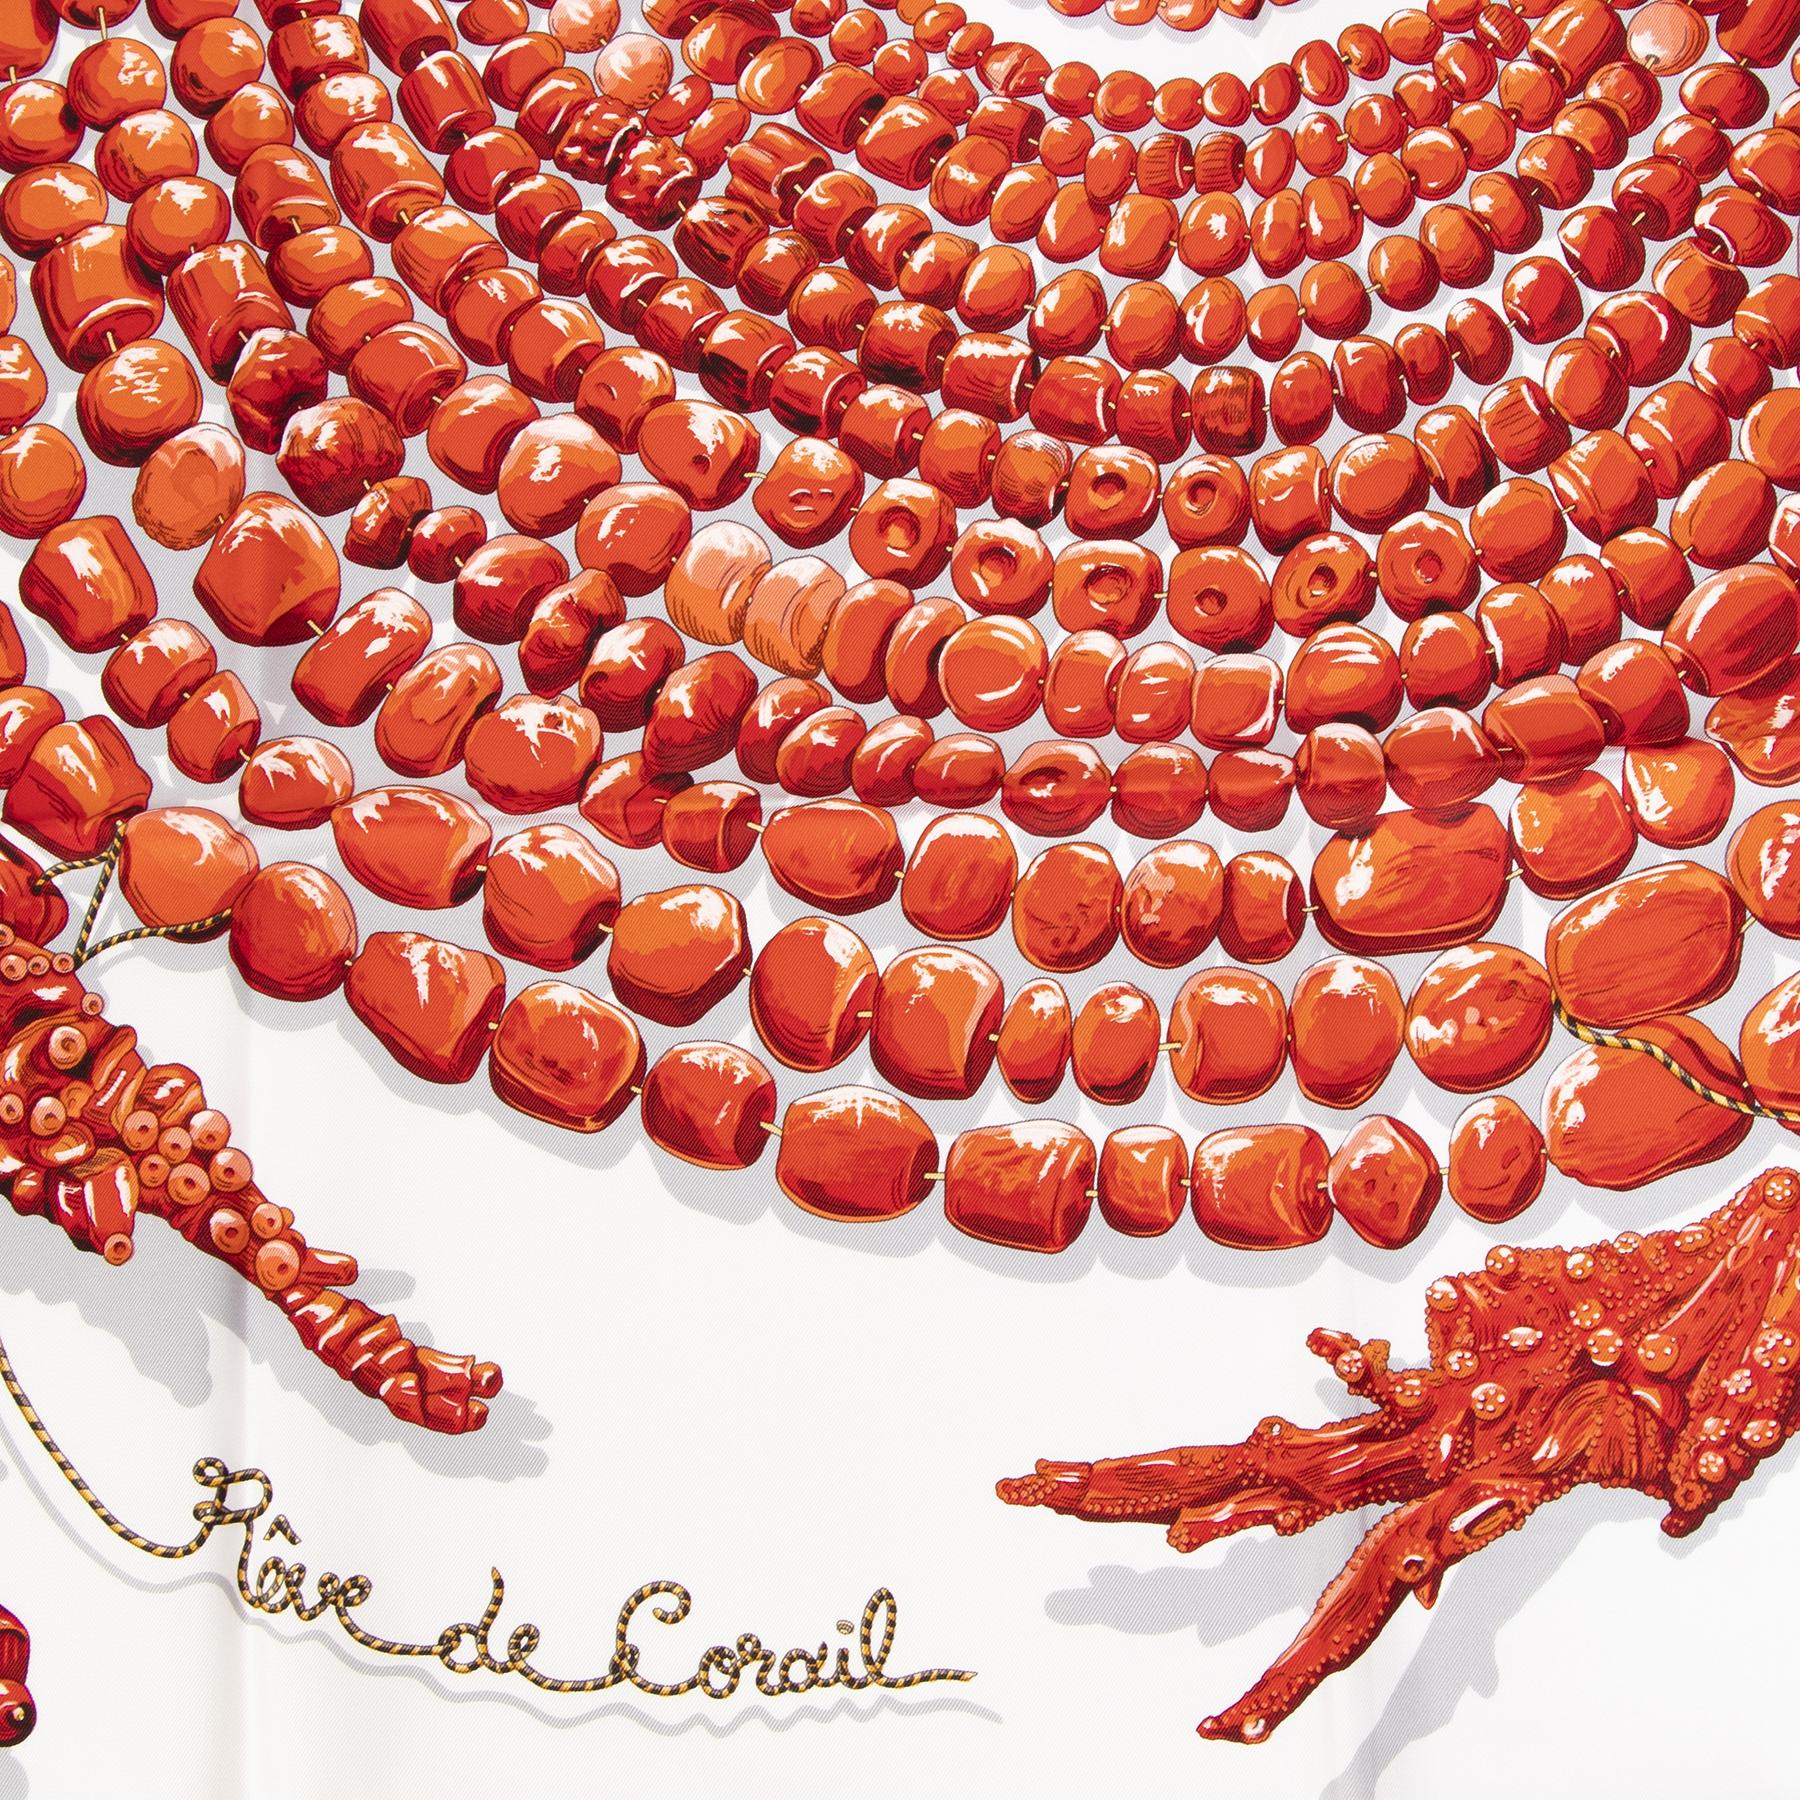 Authentieke tweedehands vintage Hermès Carre Rêve De corail Scarf koop online webshop LabelLOV